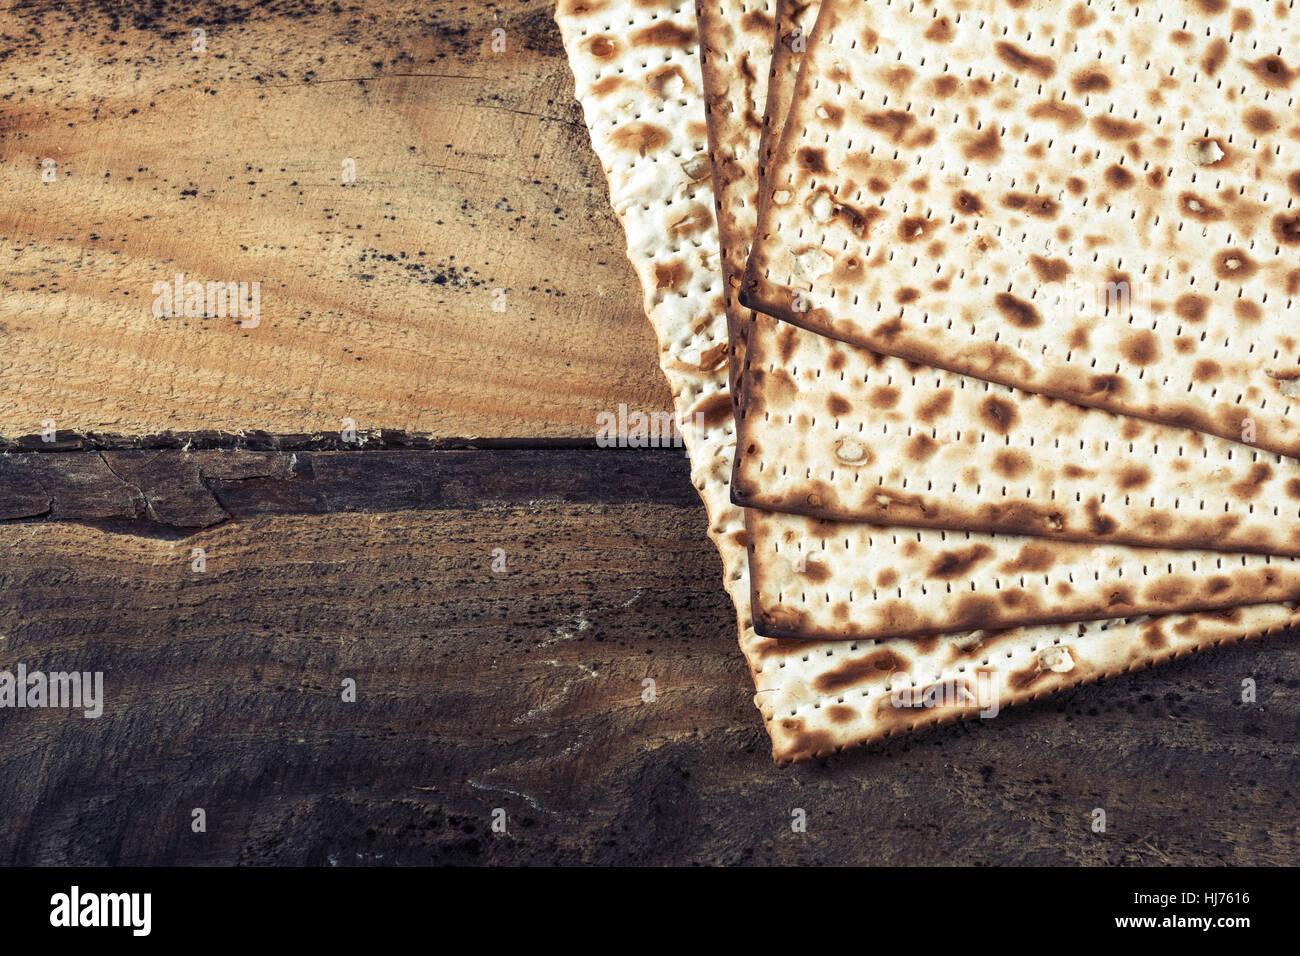 Jewish matza on Passover - Stock Image